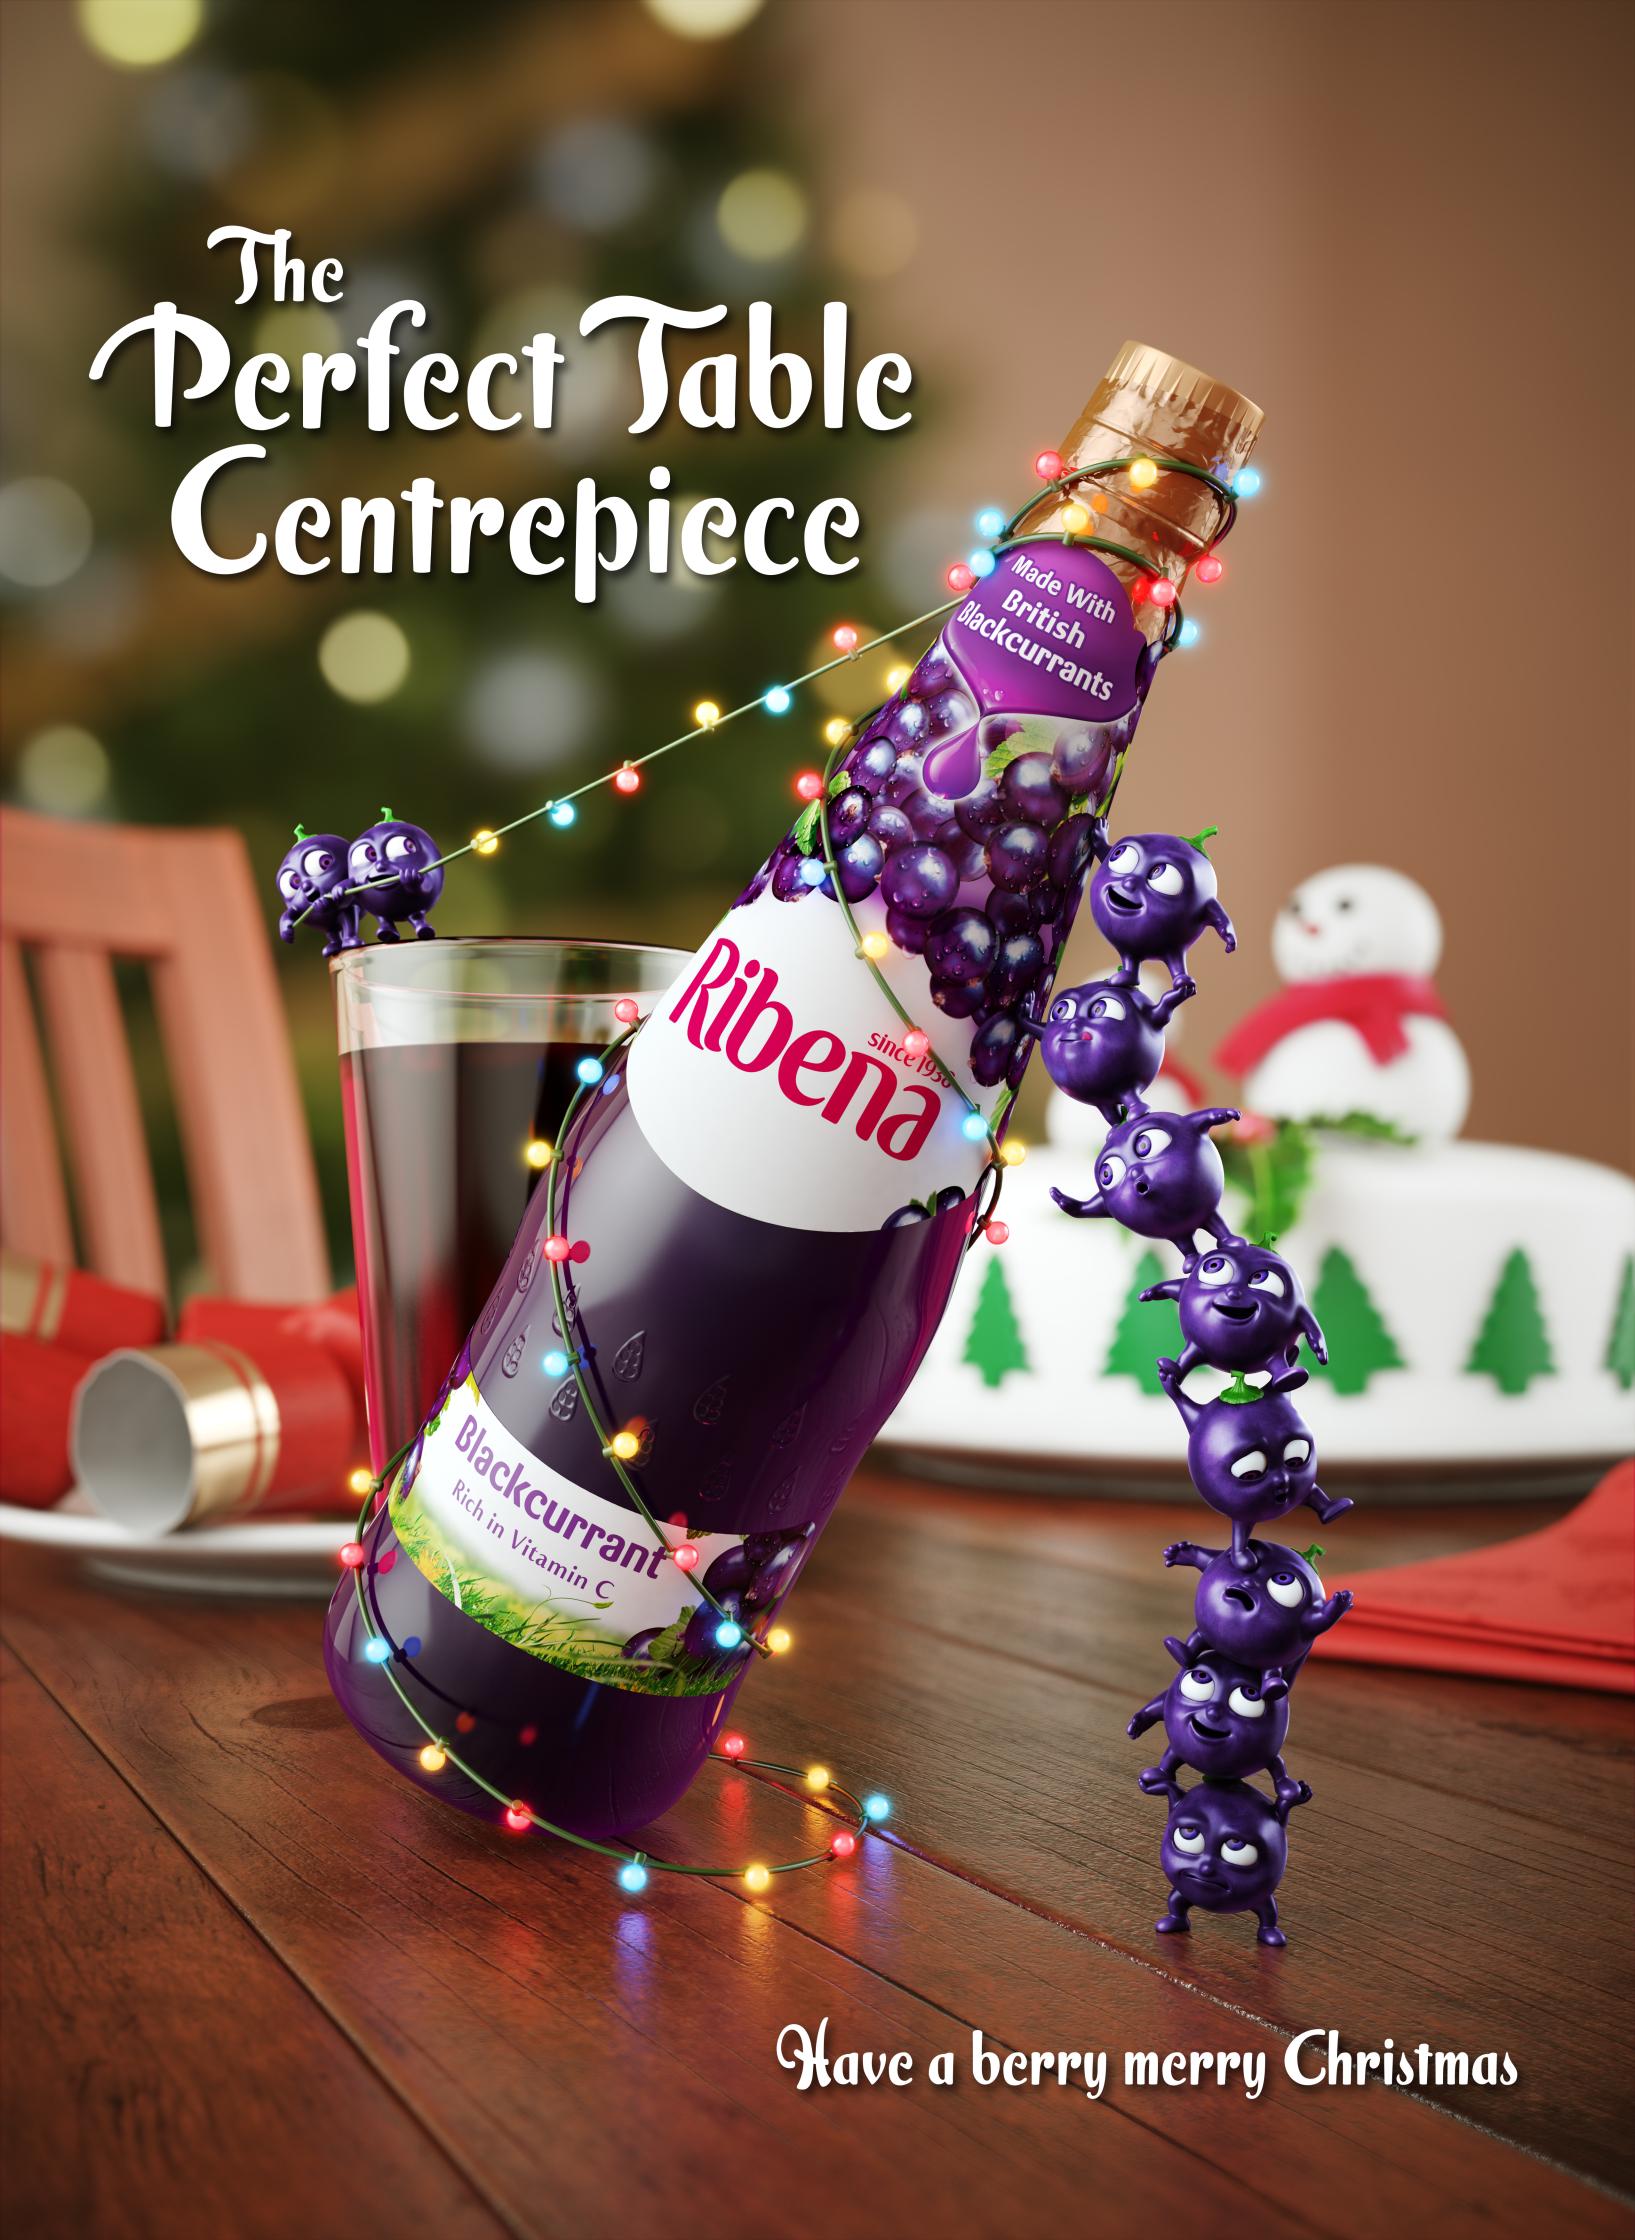 Ribena Berry Merry Christmas